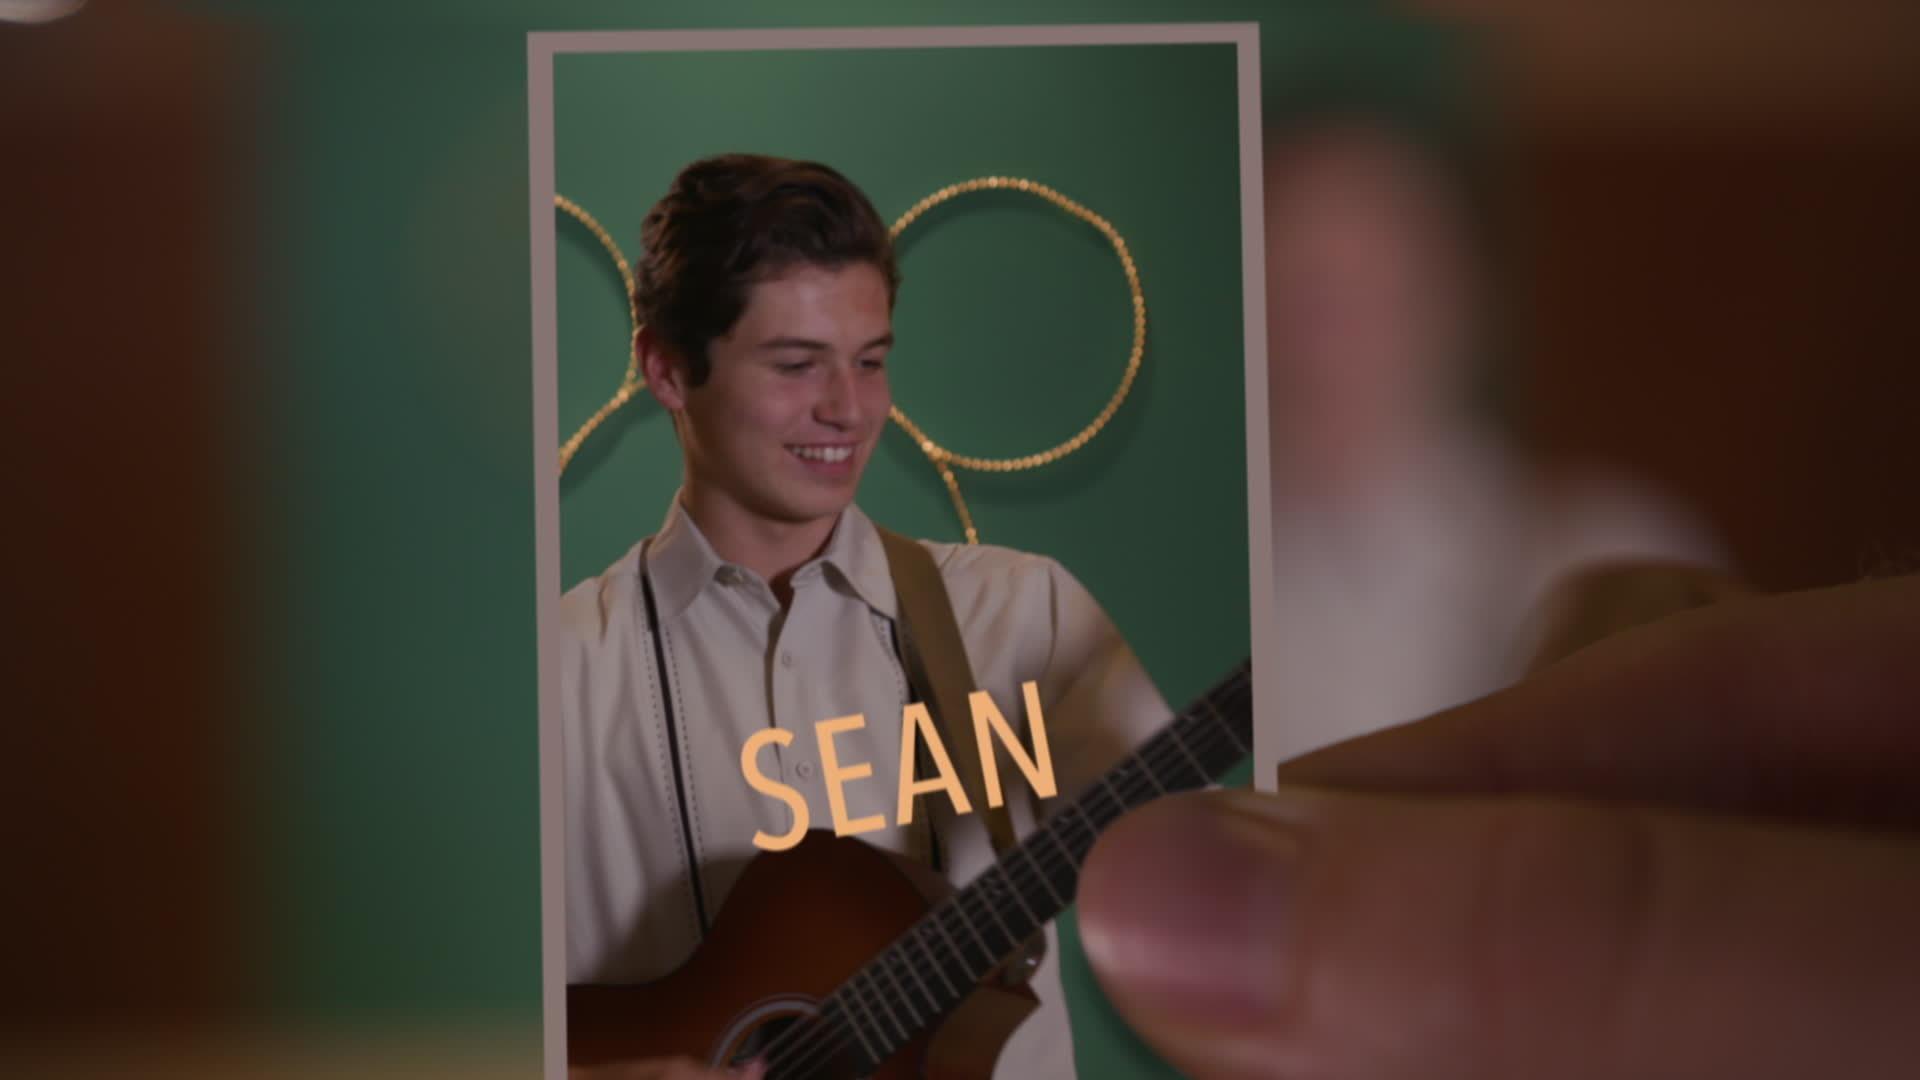 Original Song by Sean Oliu | Club Mickey Mouse